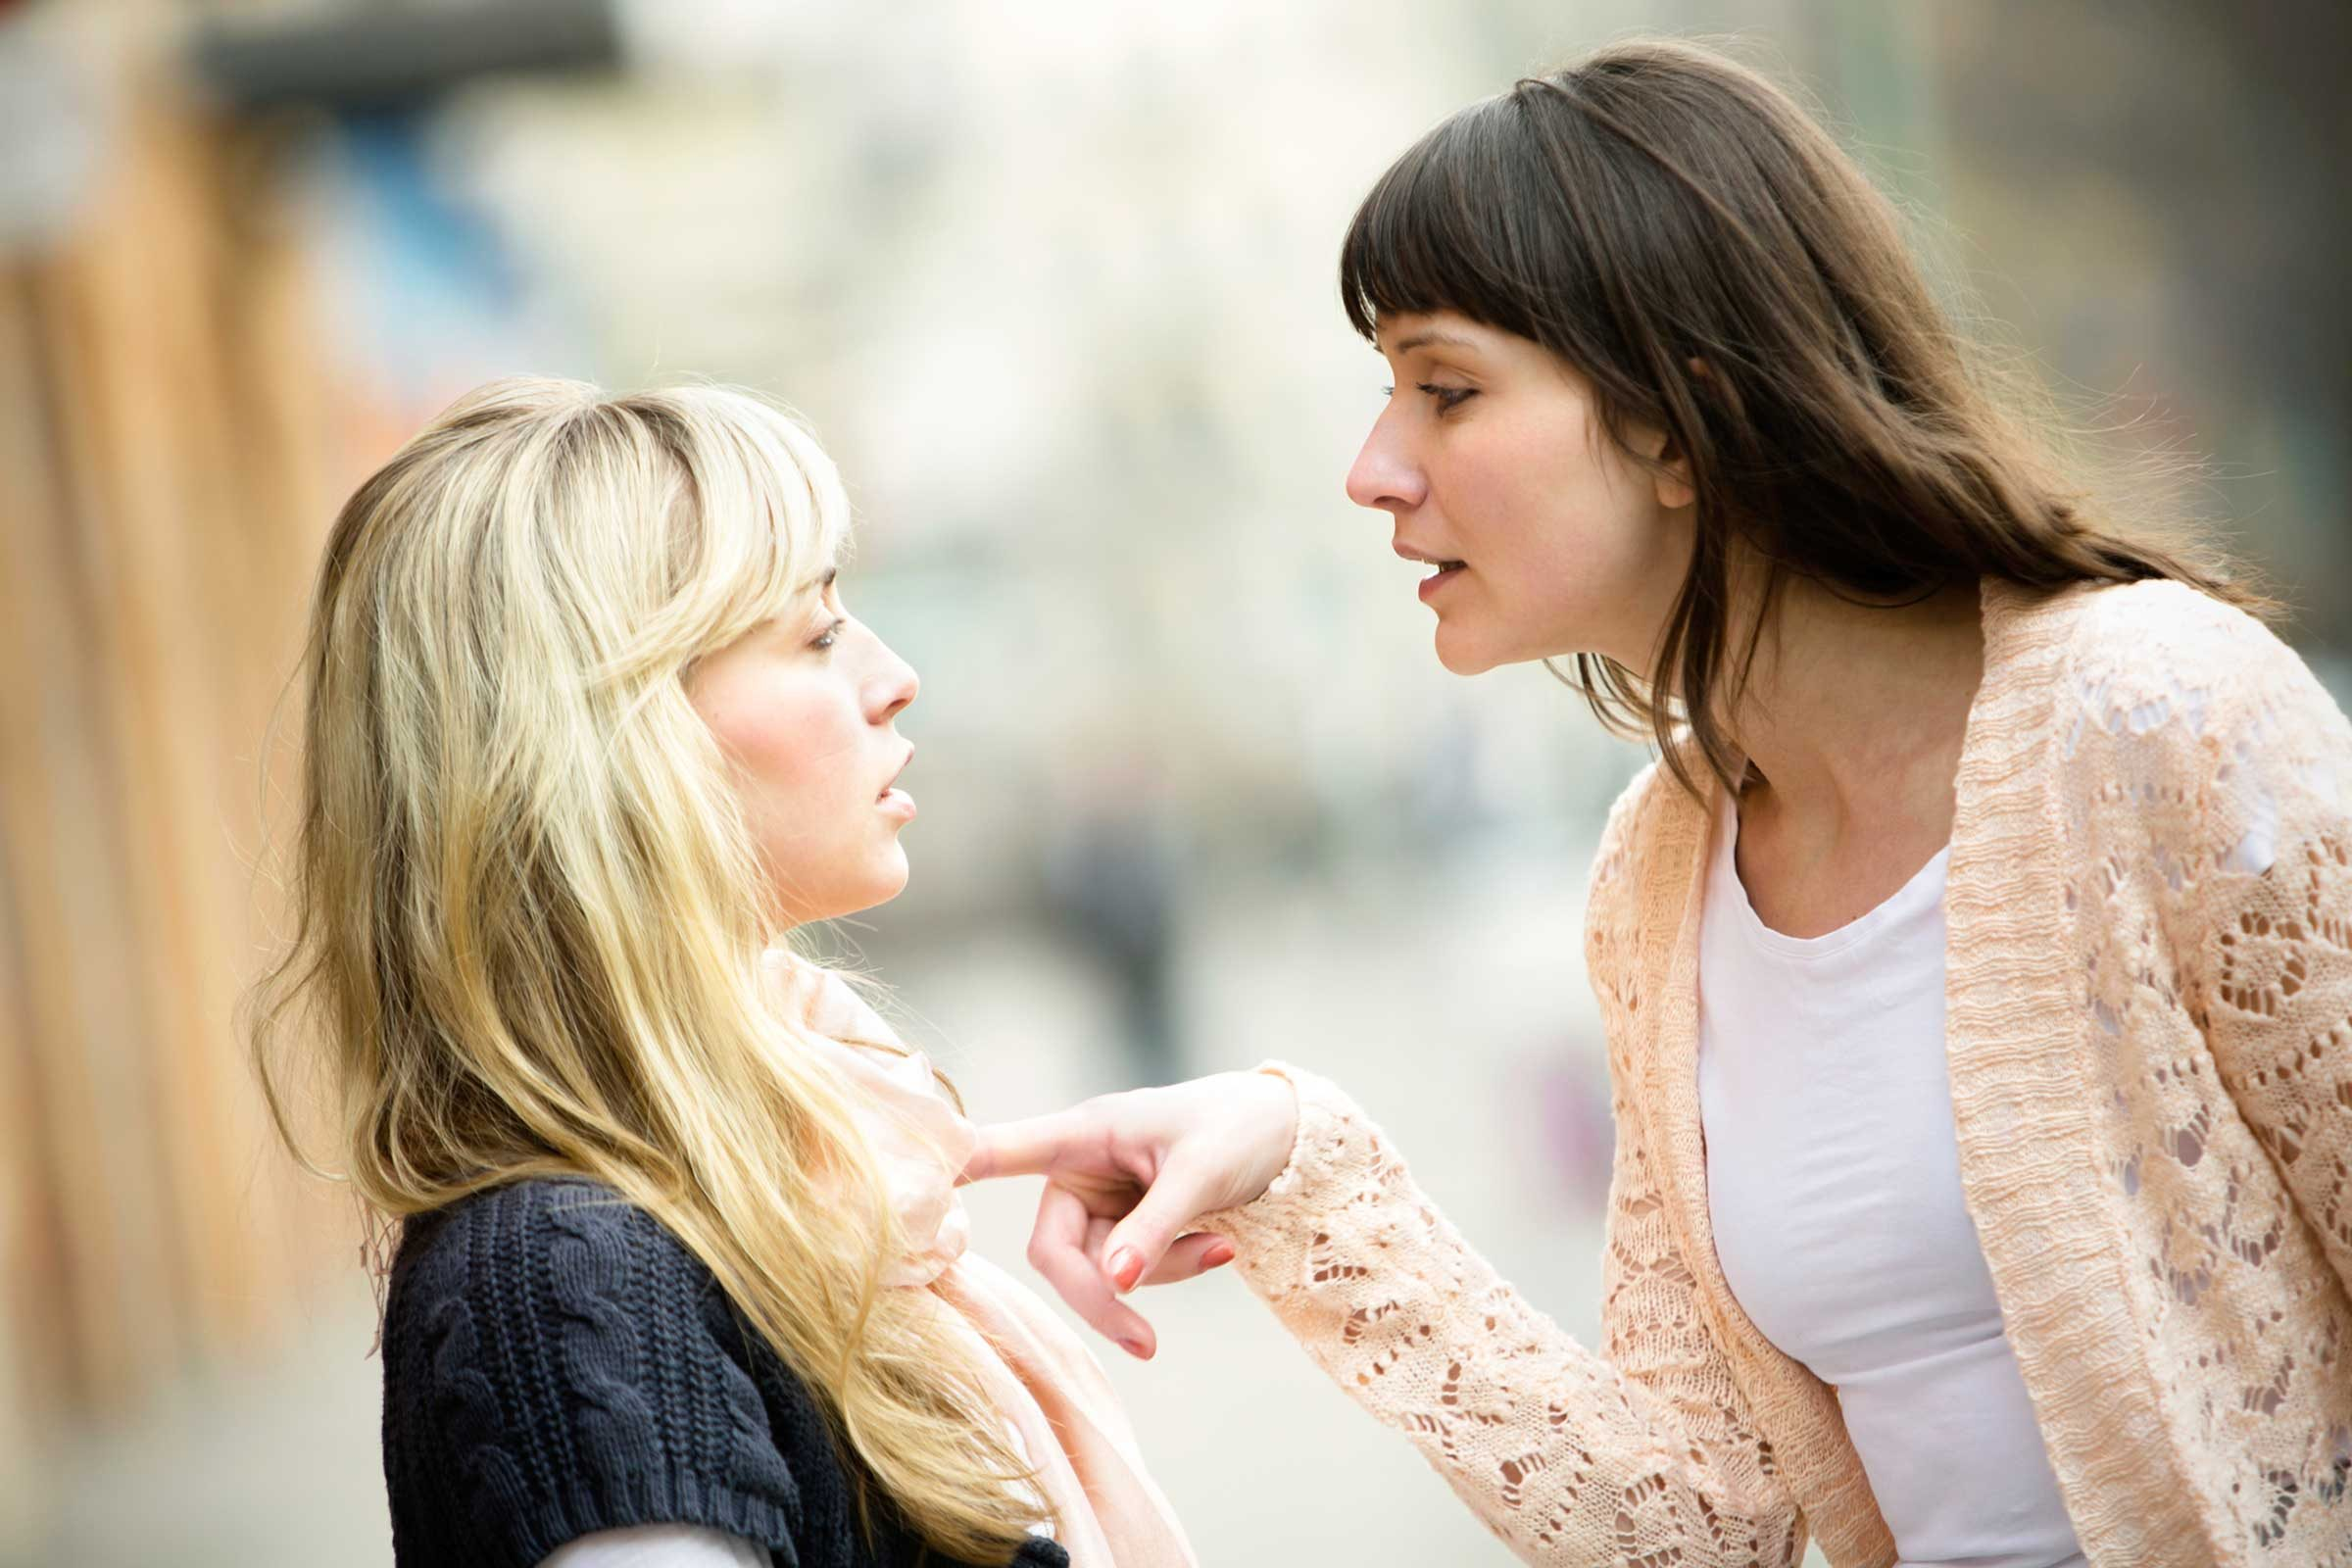 are_insensitive_person_ways_be_more_sensitive_raise_voice